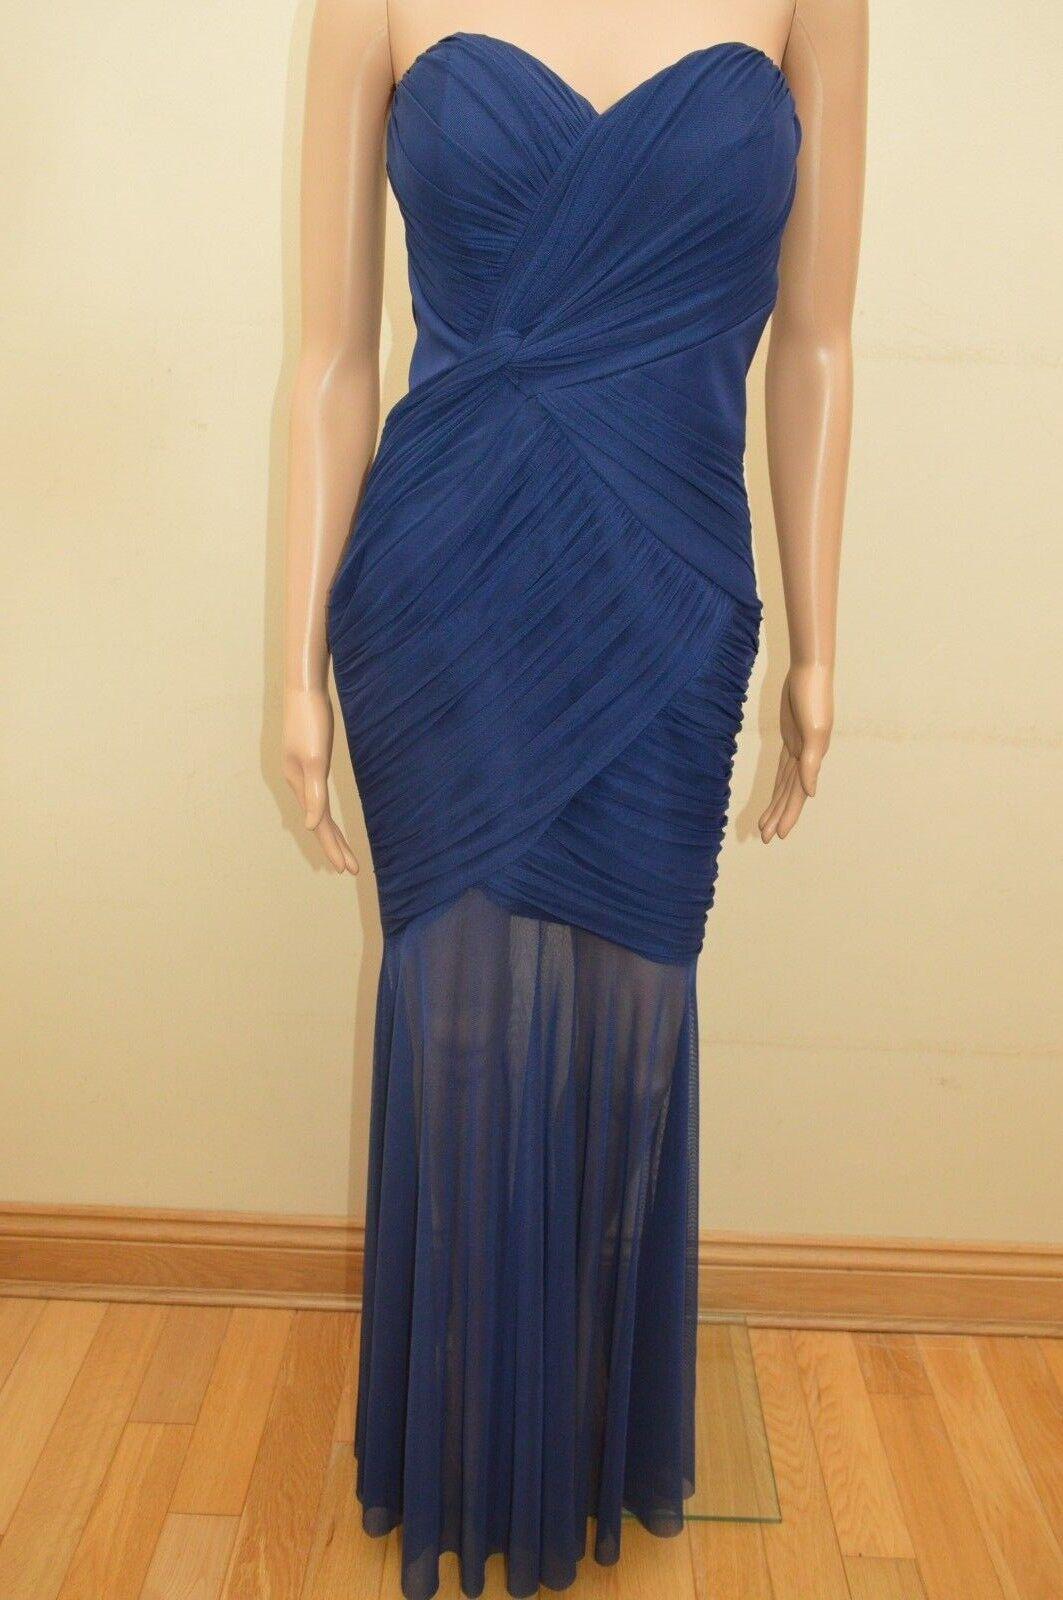 New Lipsy Navy Blau Ruched Maxi Dress Sz UK UK UK 12 | Shopping Online  | Moderater Preis  | Qualitätsprodukte  21d52a